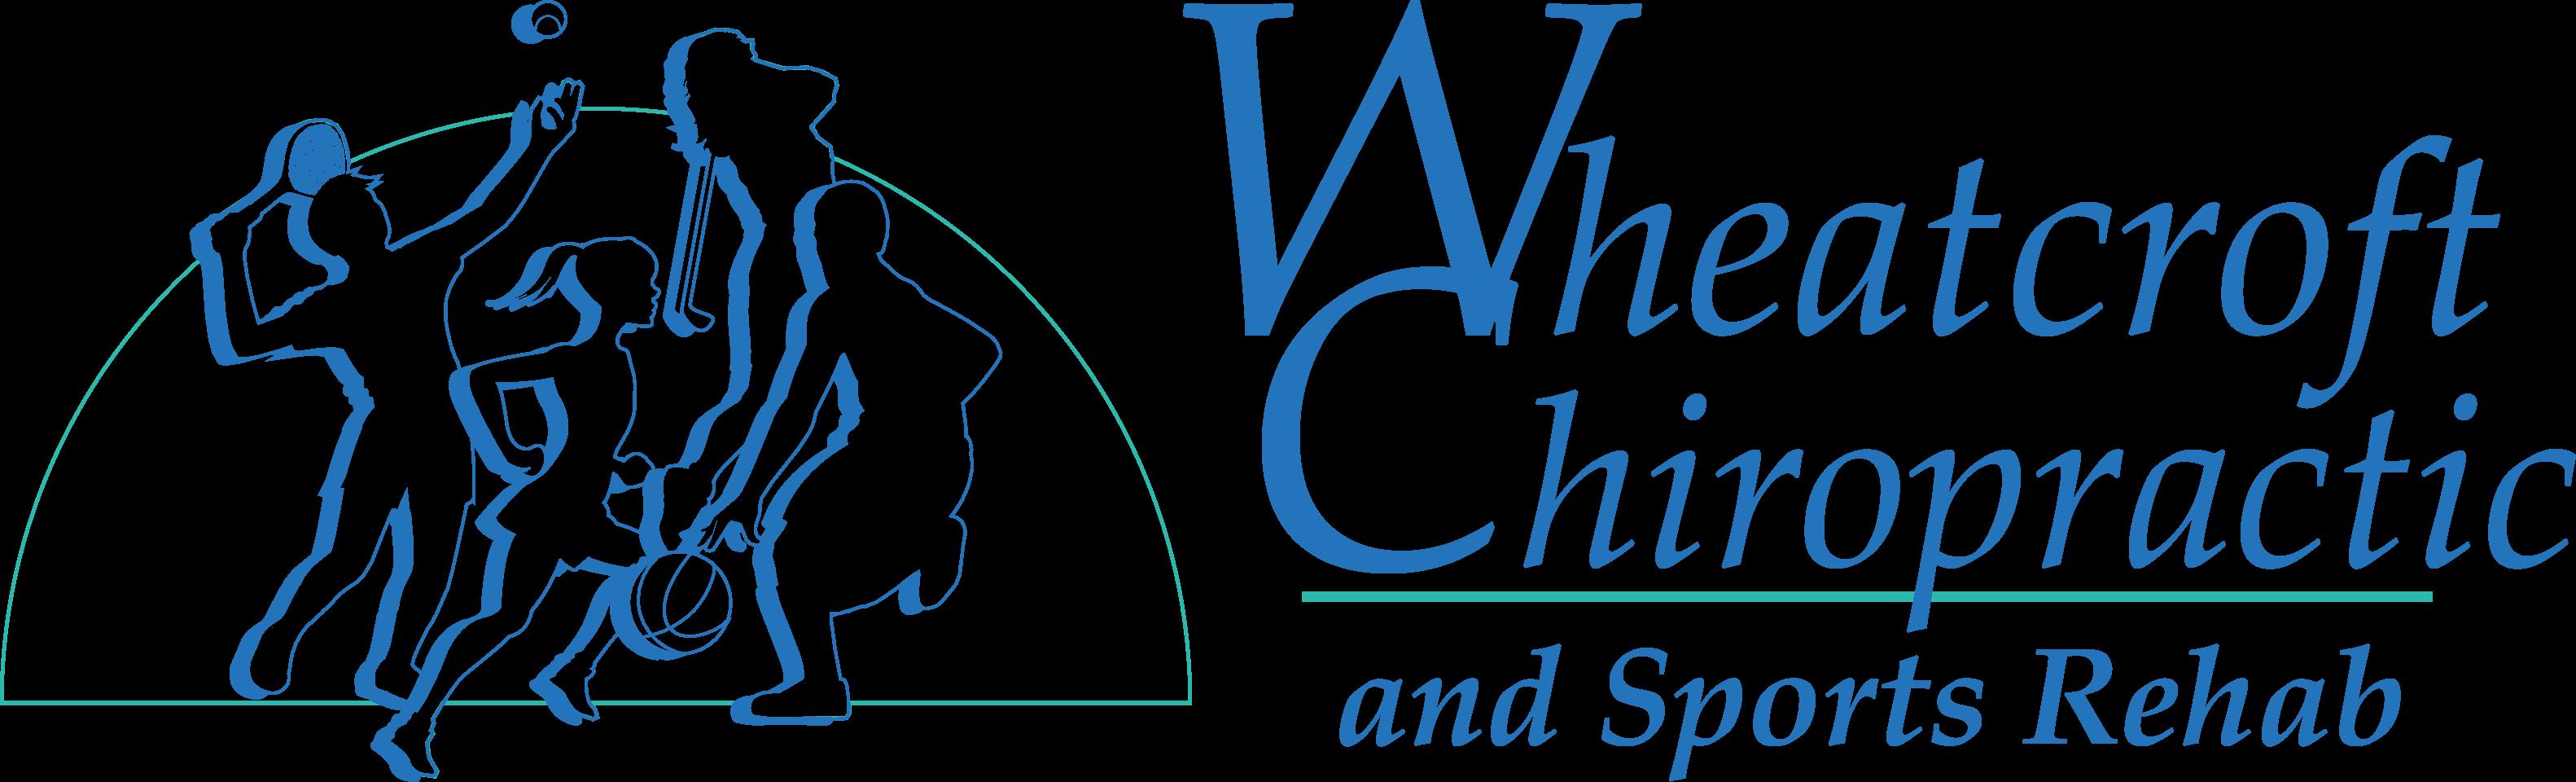 chattanooga chiropractor graston technique wheatcroft